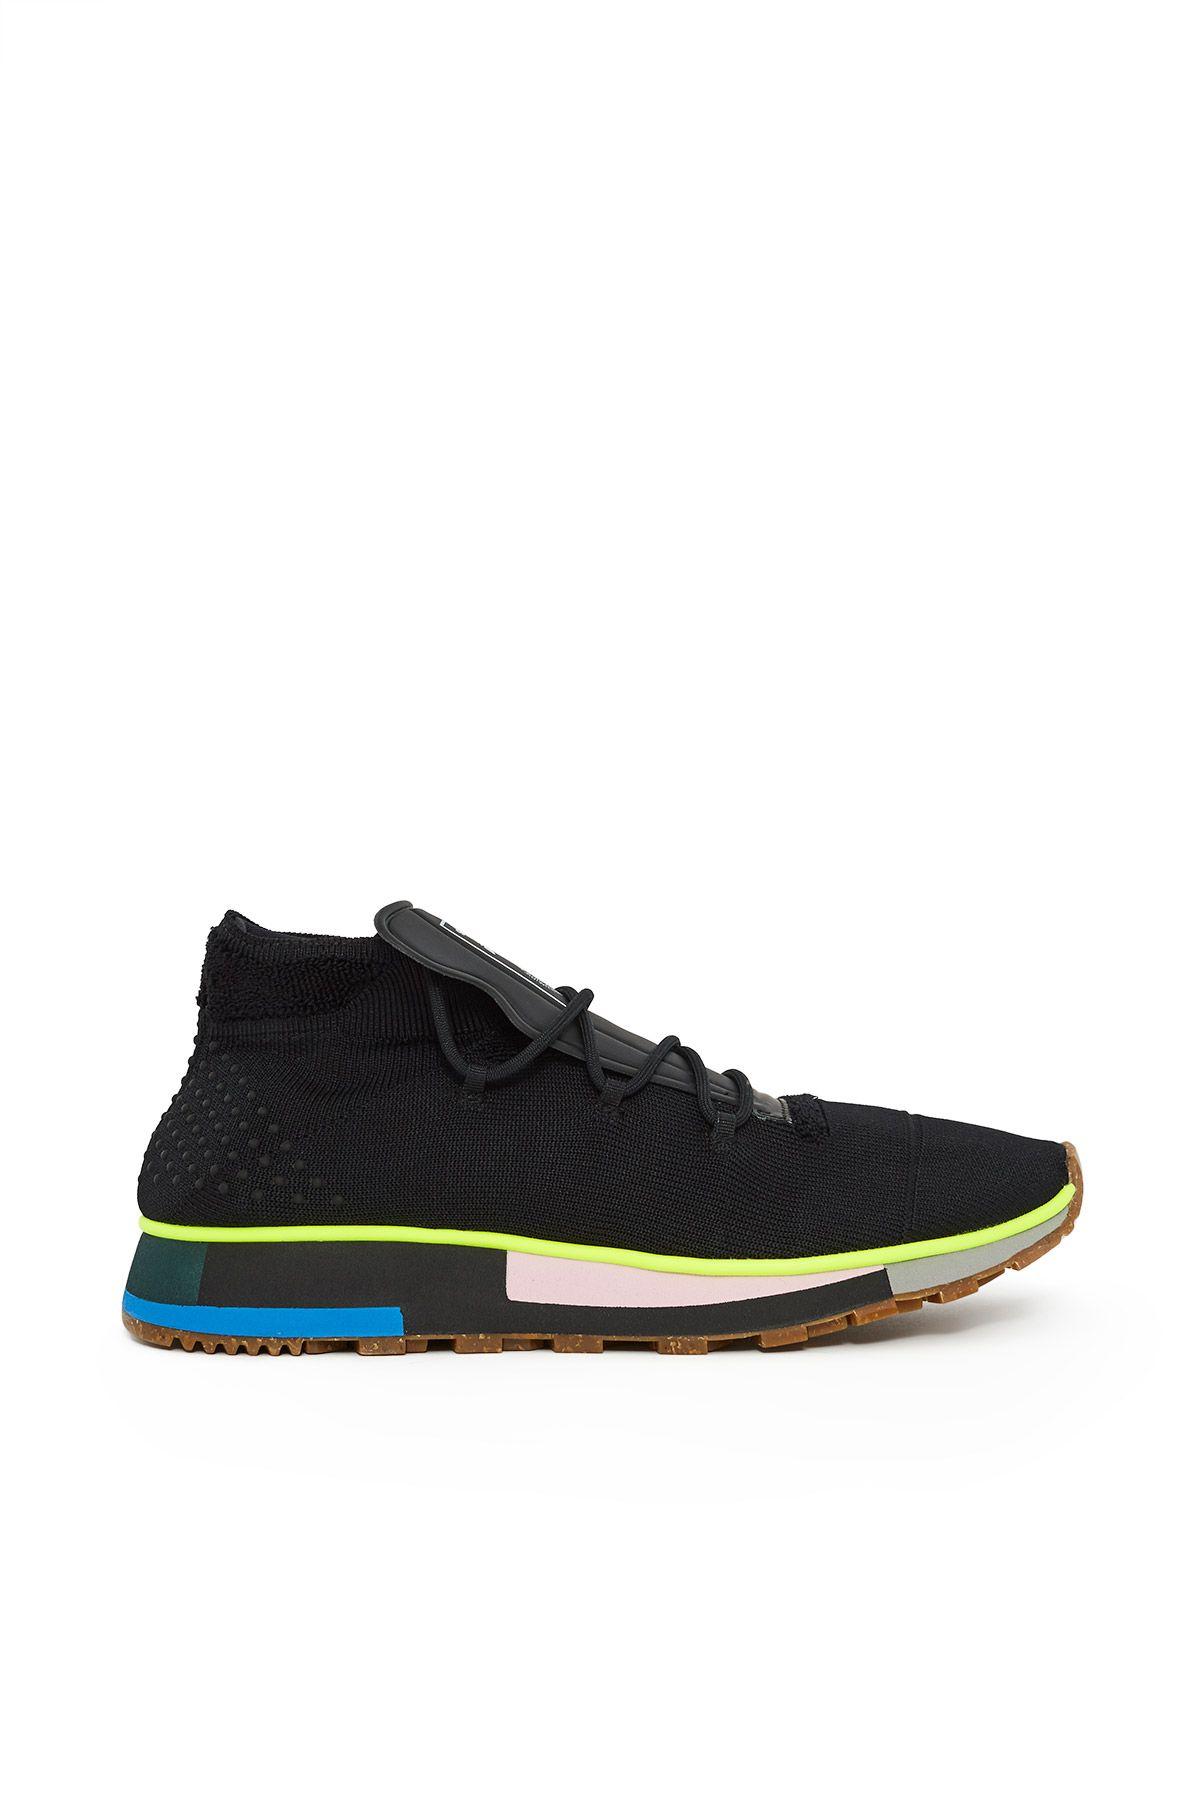 adidas originali da alexander wang, ah corri metà scarpe adidas